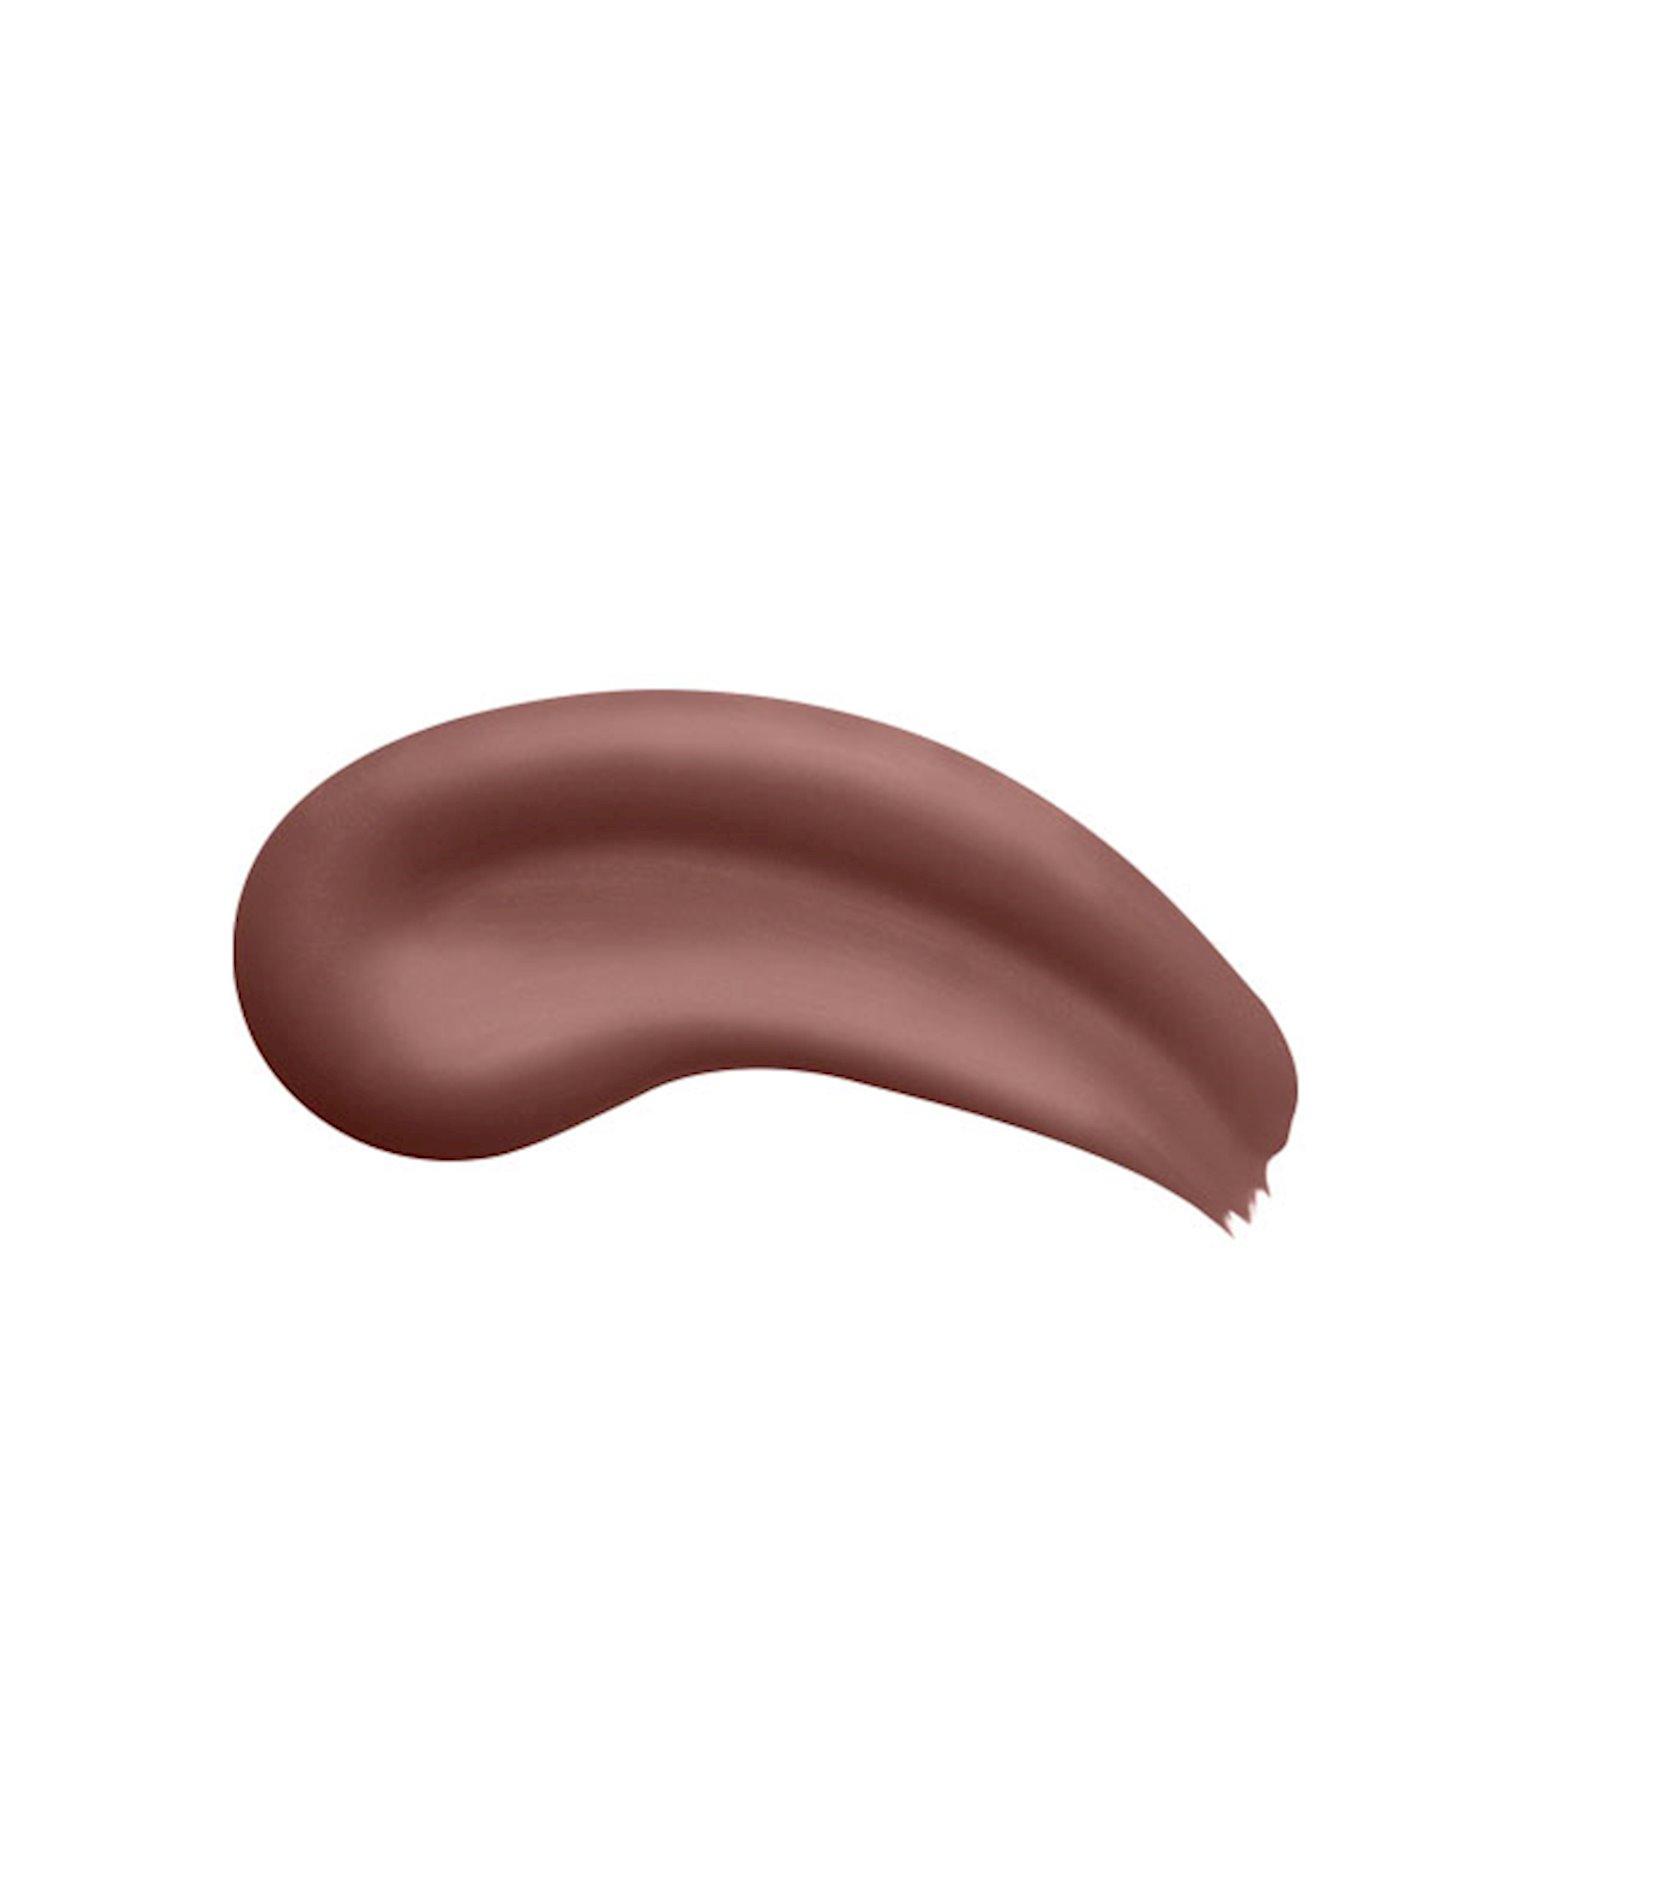 Dodaq üçün ultra mat maye pomada  L'Oreal Paris Les Chocolats Ultra Matte Liquid Lipstick 852 Box Of Chocolates